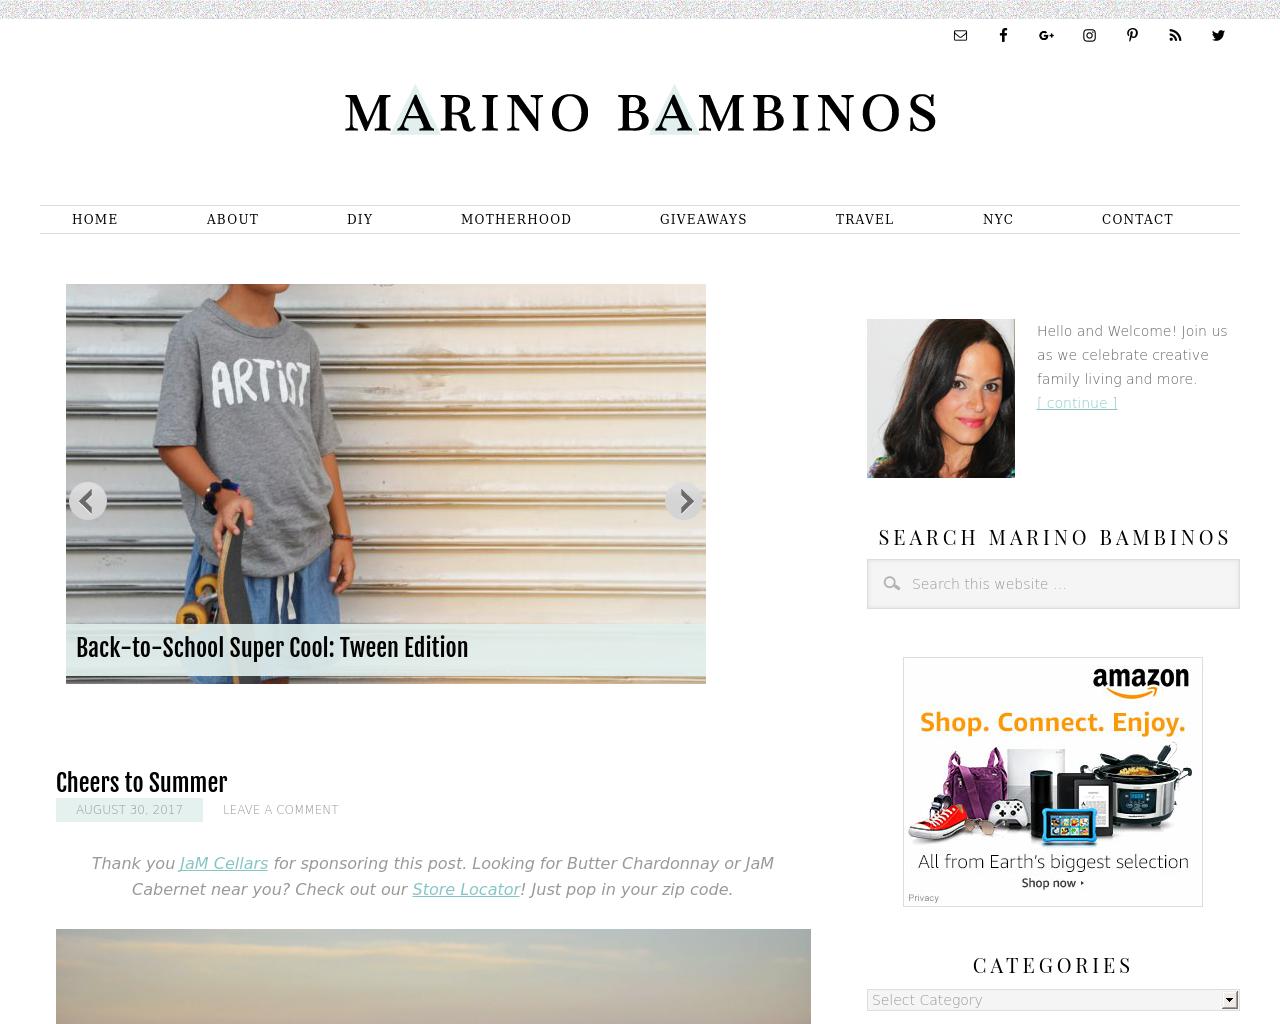 Marino-Bambinos-Advertising-Reviews-Pricing